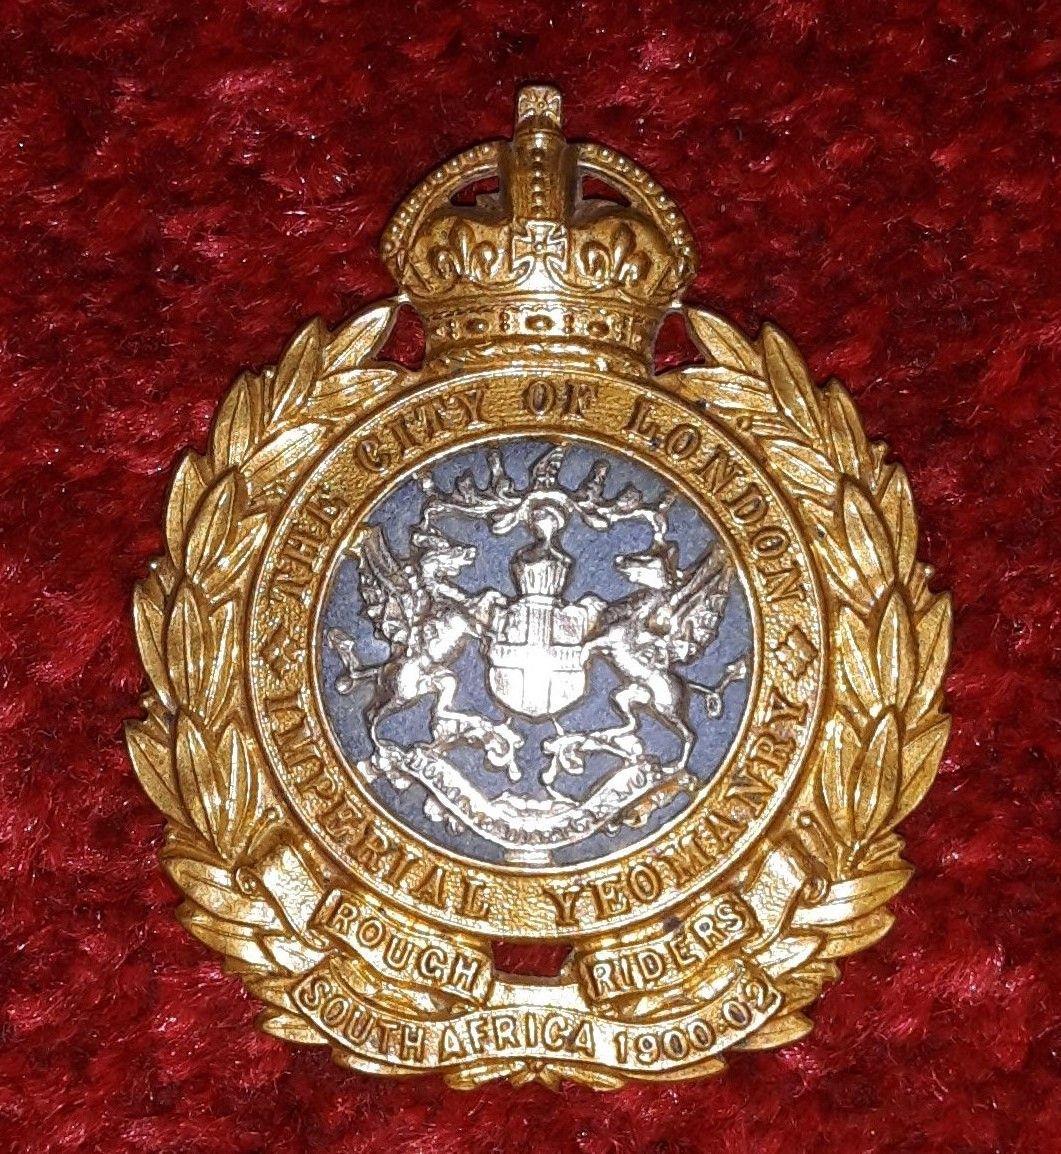 Yeomanry badges